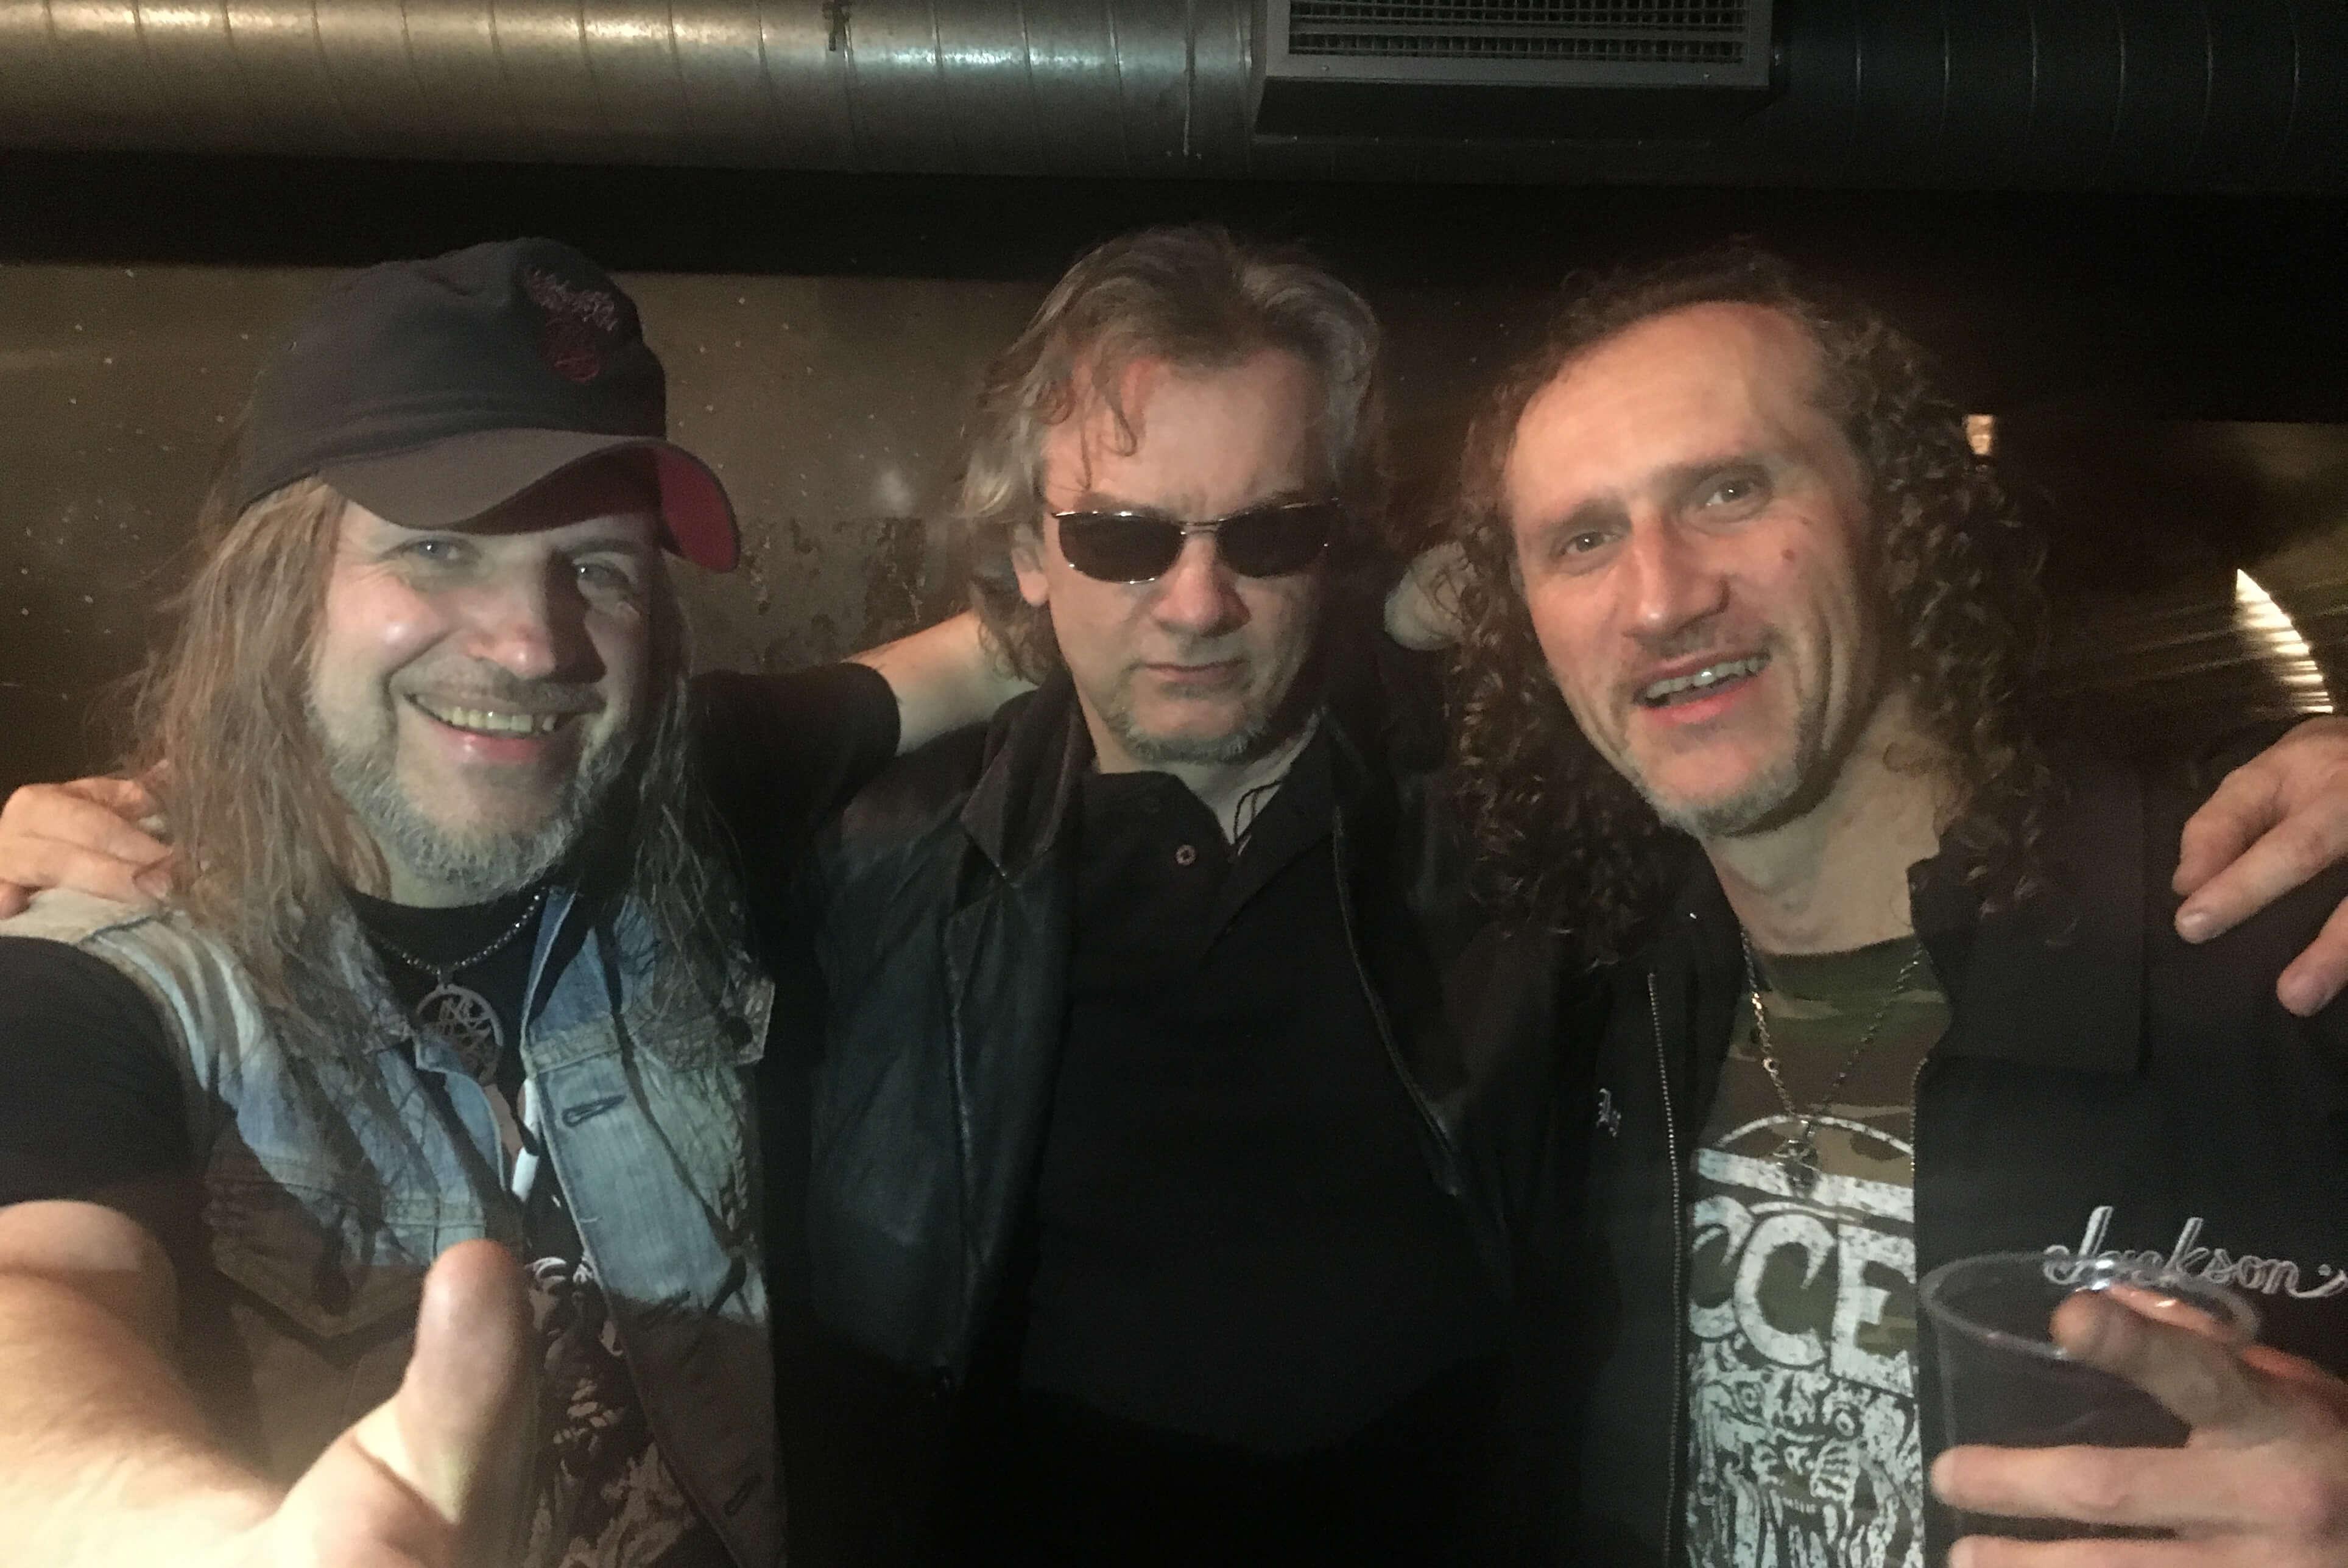 Vader & Piotr Luczyk